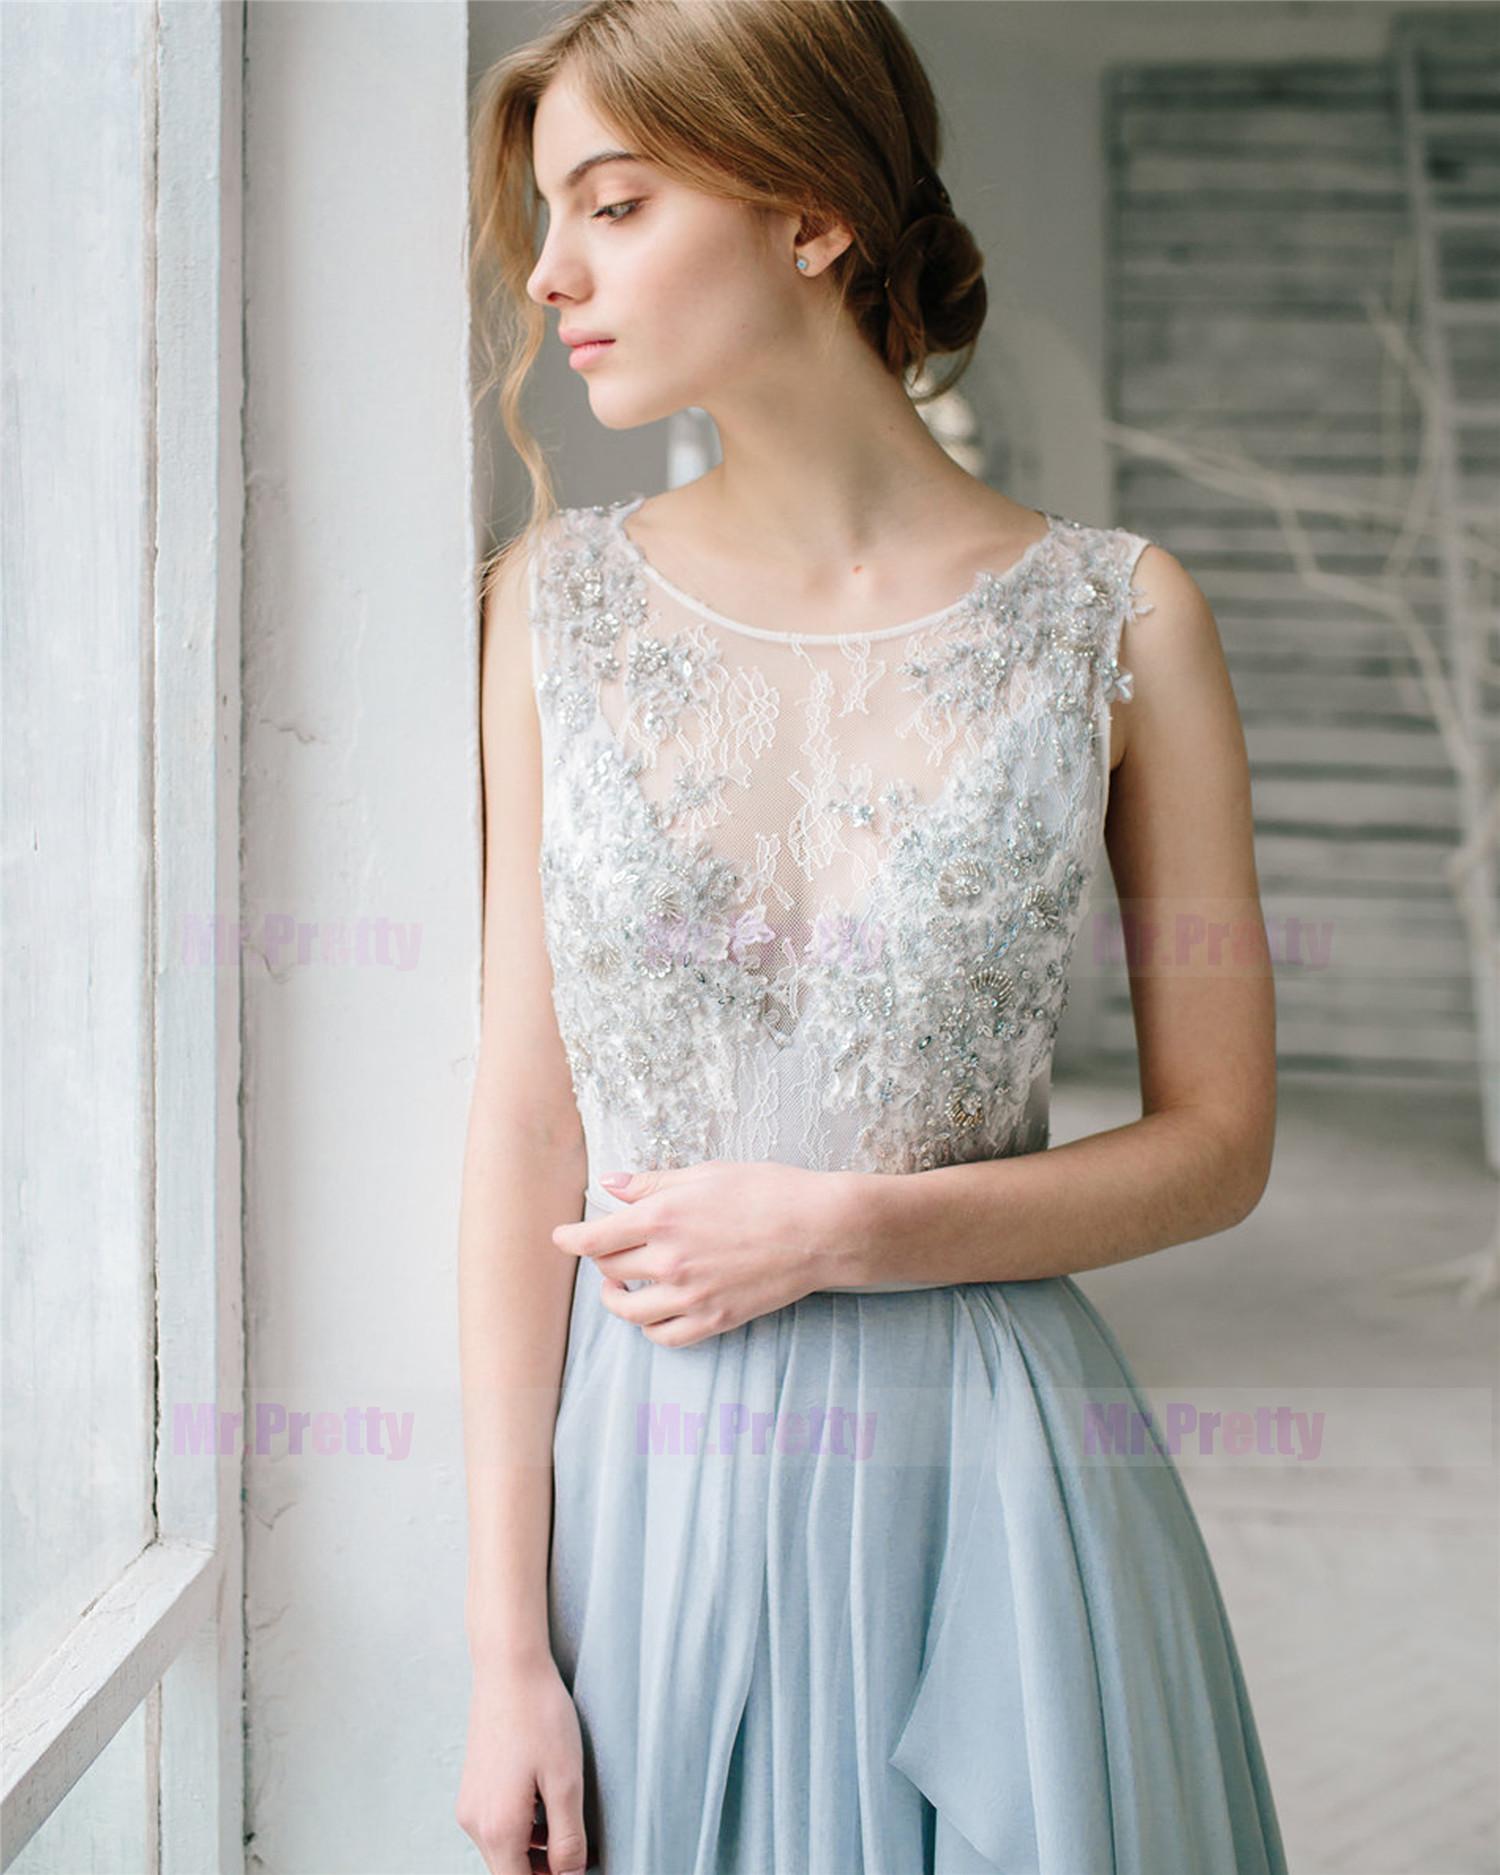 bf0b8aaf6b6729 Light Grey Lace Beads Bridal Top 2 Pieces Wedding Top